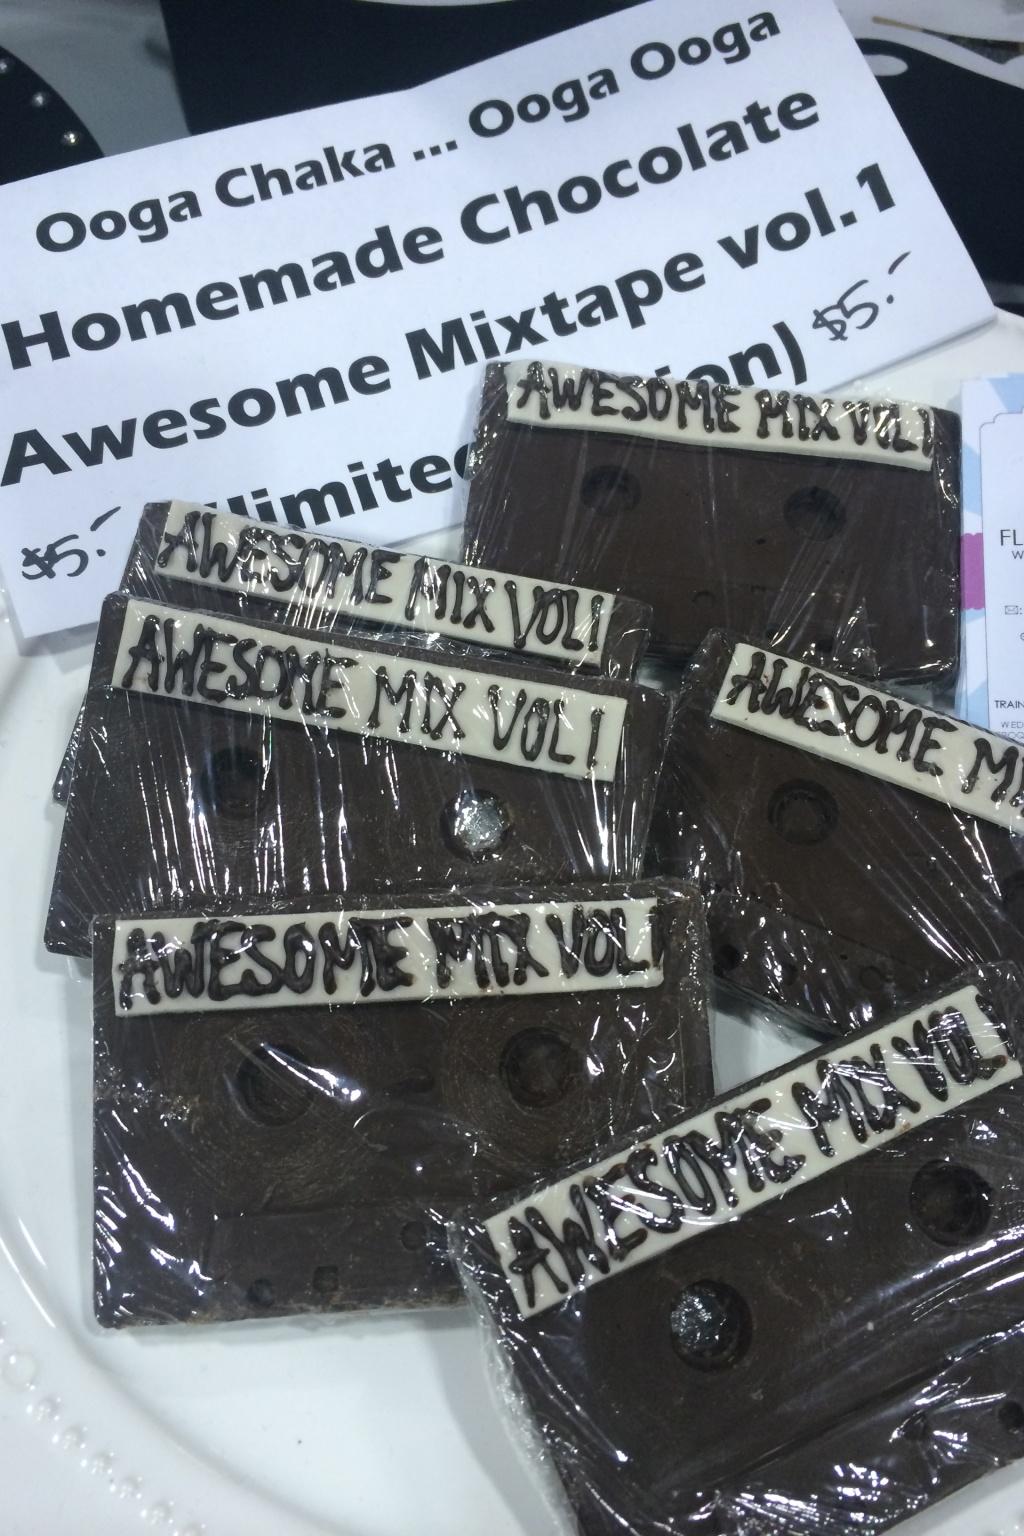 Awesomer Mix Vol. 1 - edible, chocolate remix